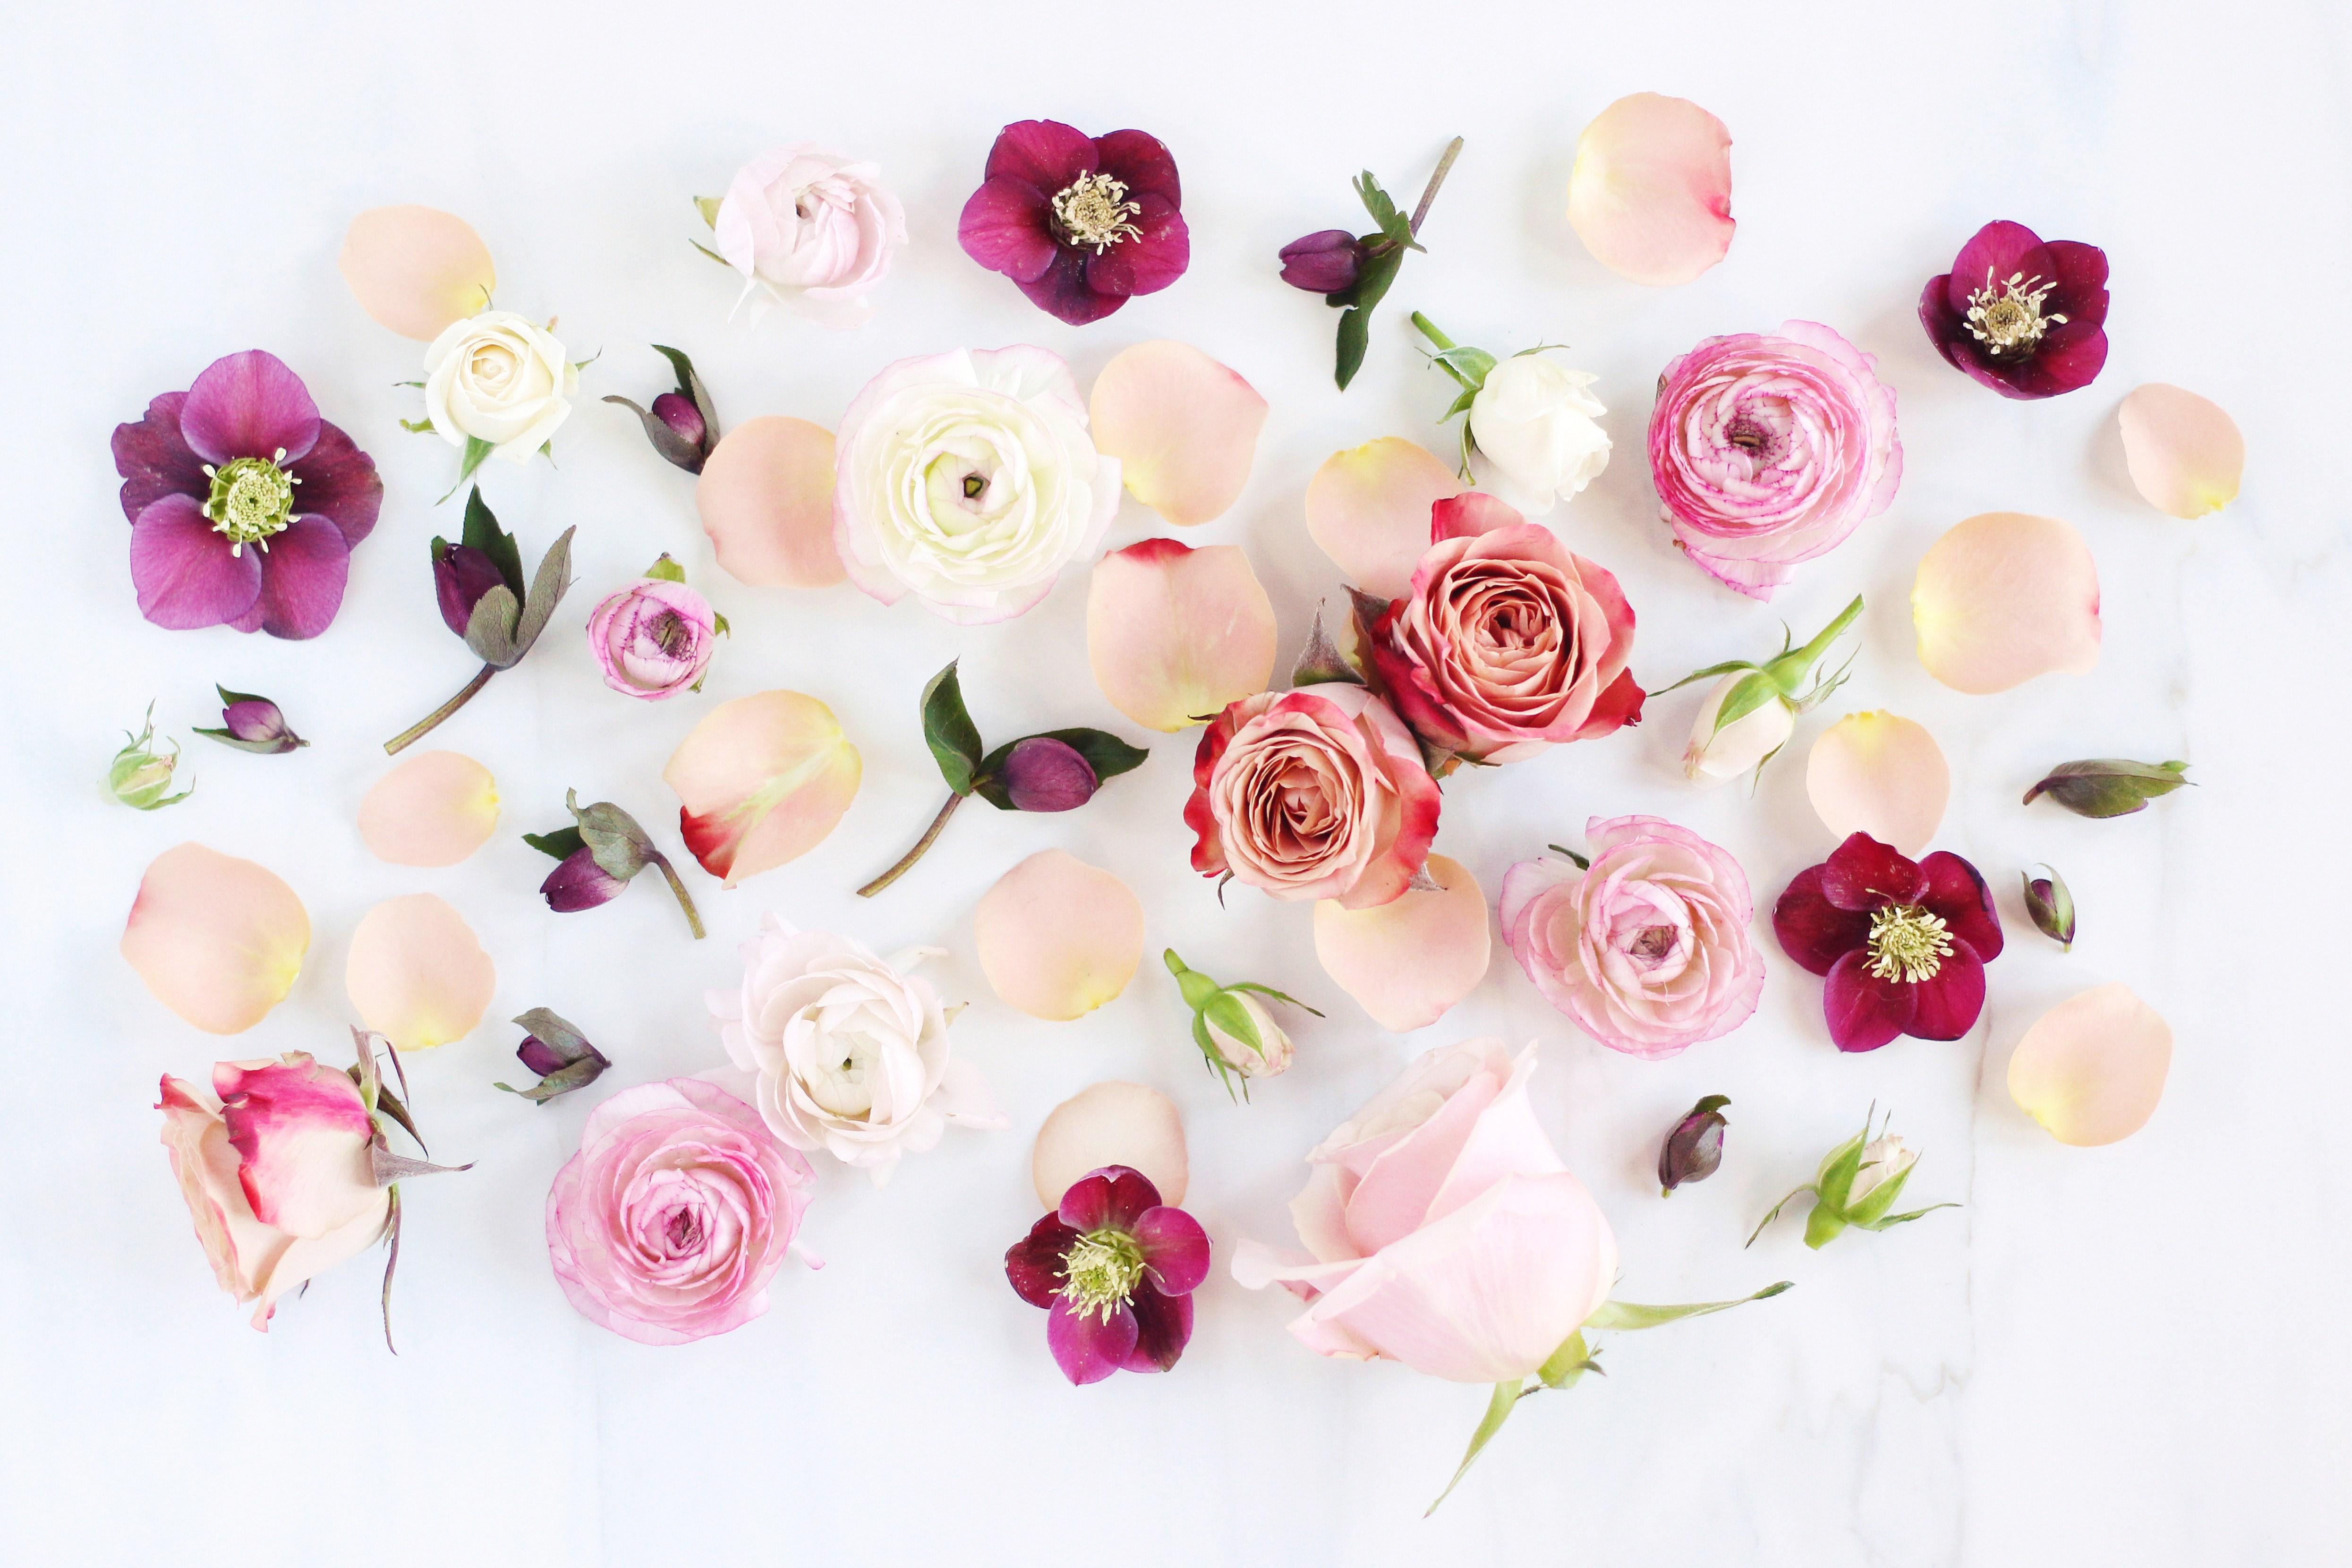 Digital Blooms February 2017   Aesthetic Desktop Wallpaper Flowers 4980x3320